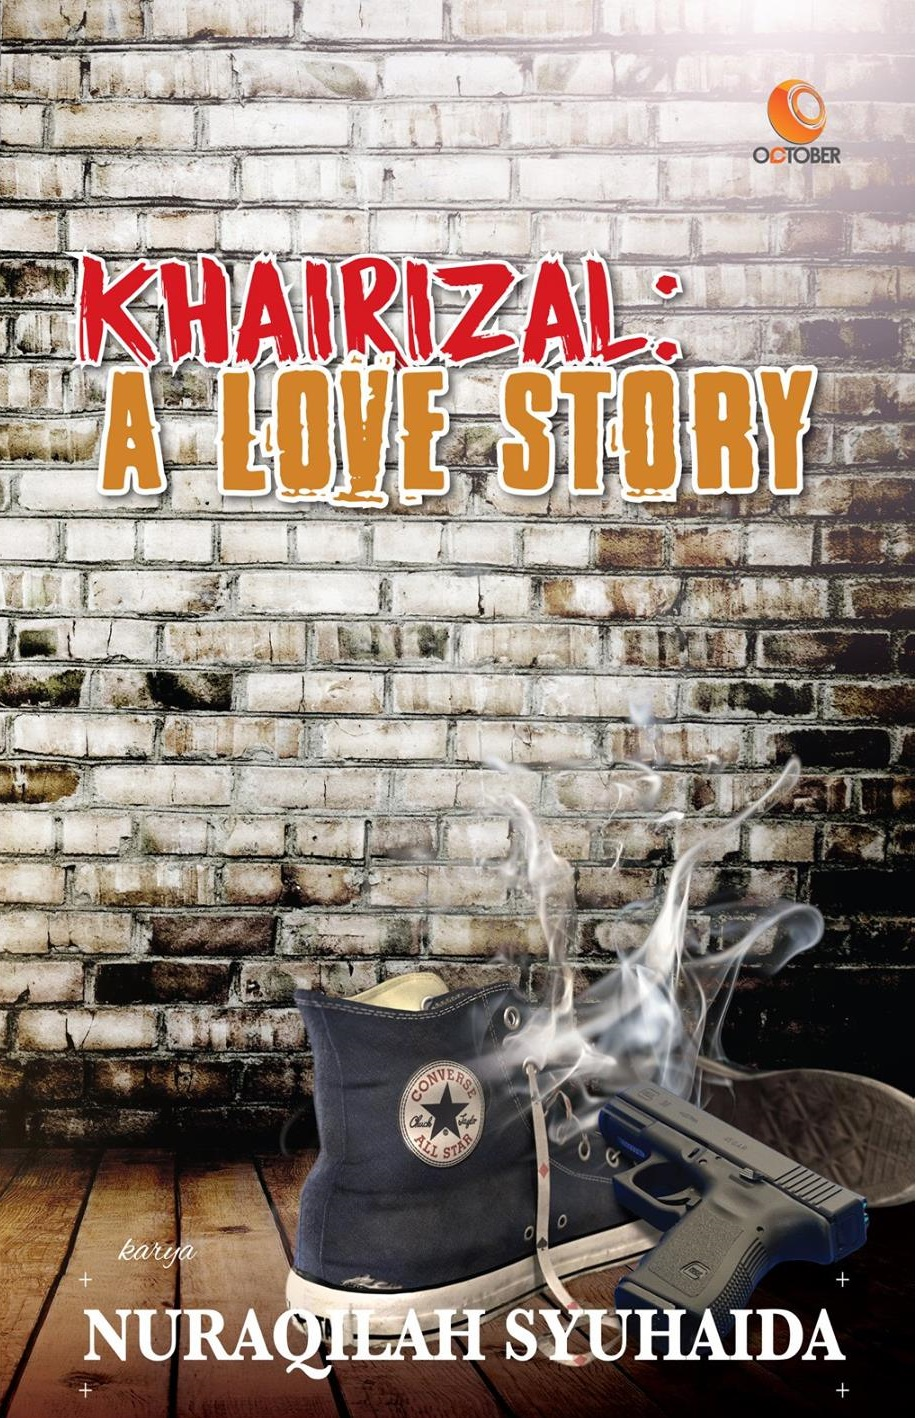 KhaiRizal : A Love Story